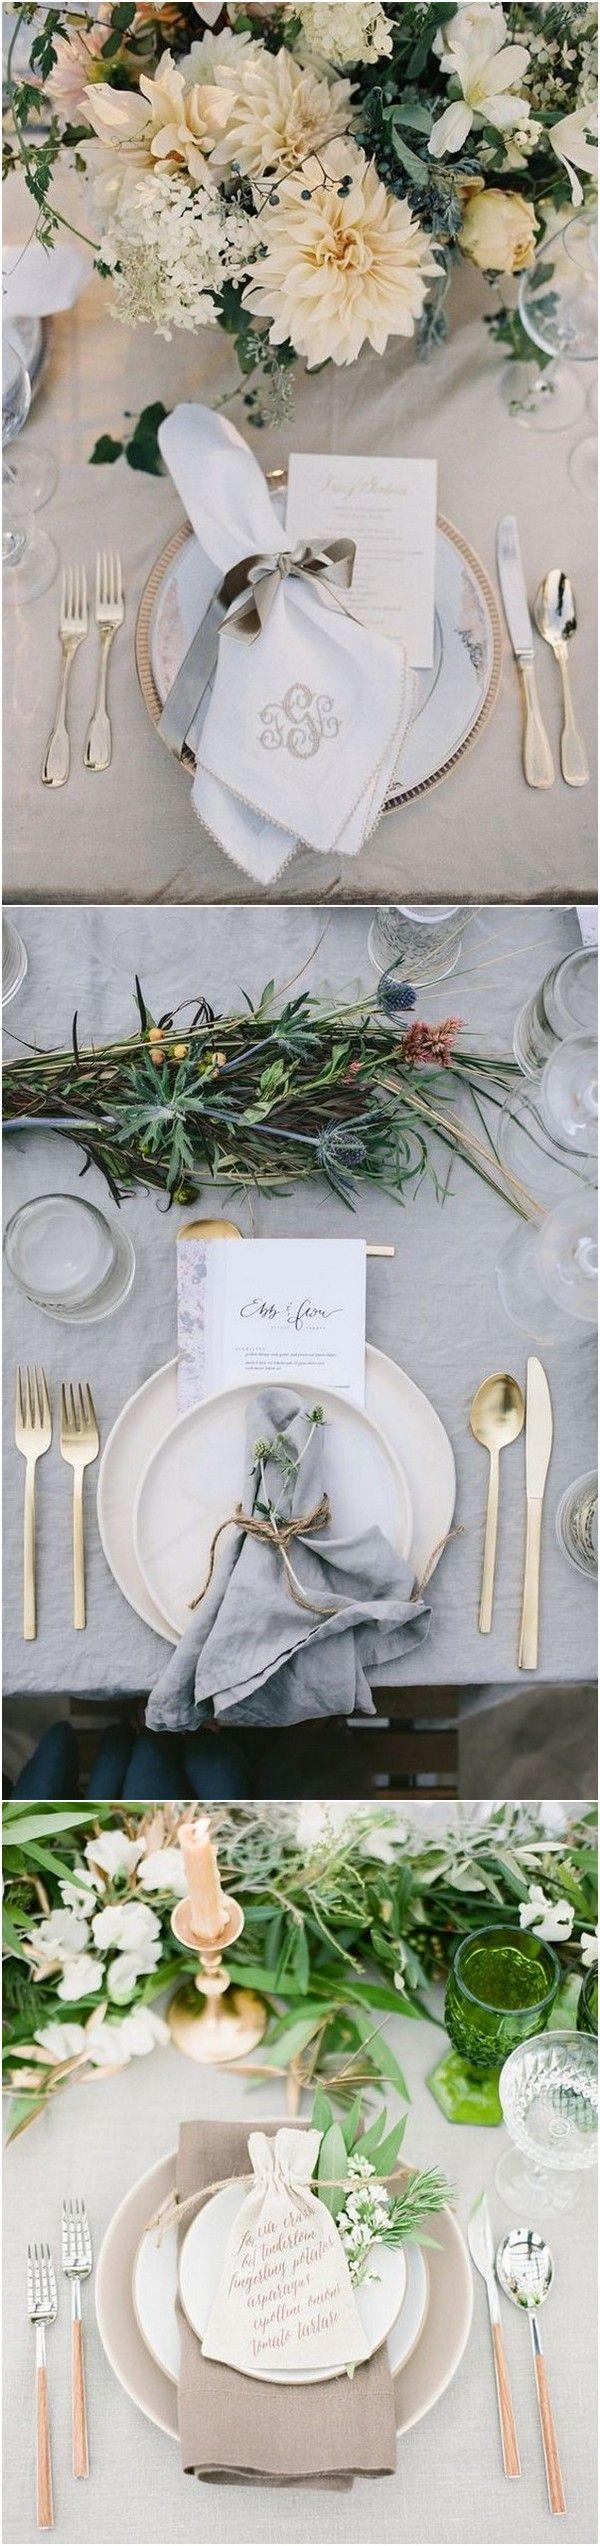 Trending u  Elegant Neutral Color Wedding Ideas  Bridal